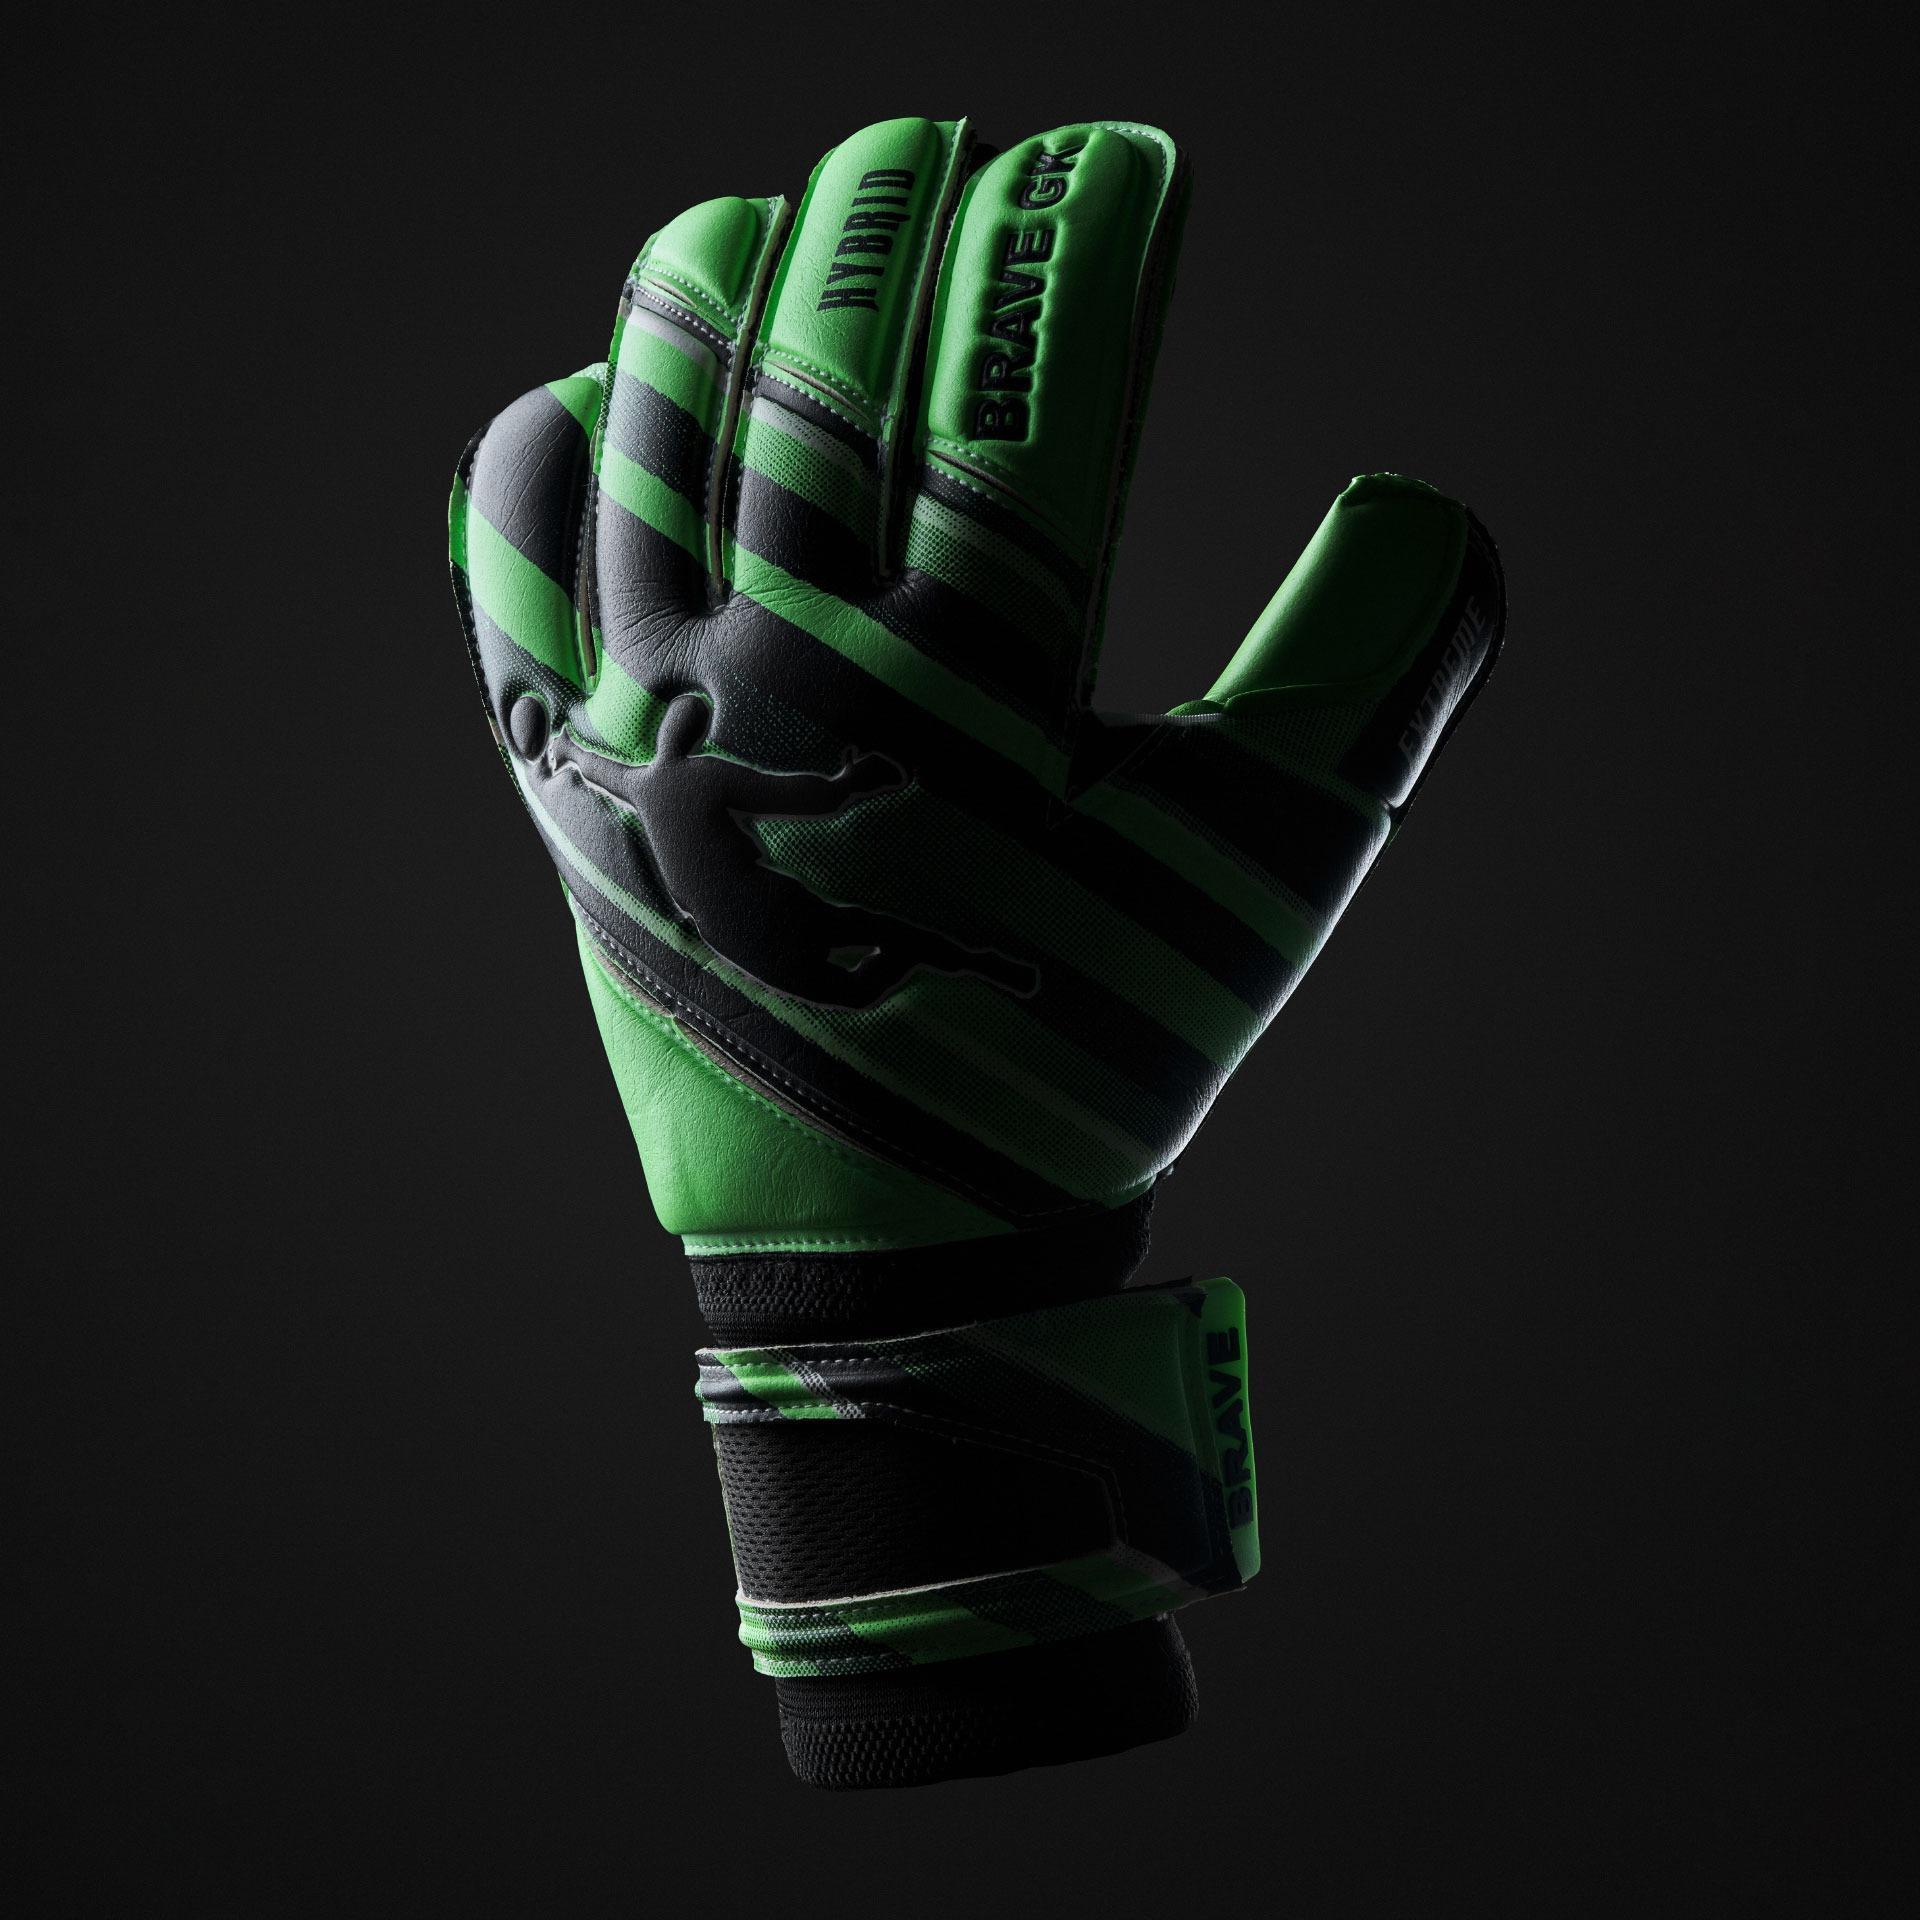 Вратарские перчатки Brave GK Extreme-официальный интернет-магазин Brave GK